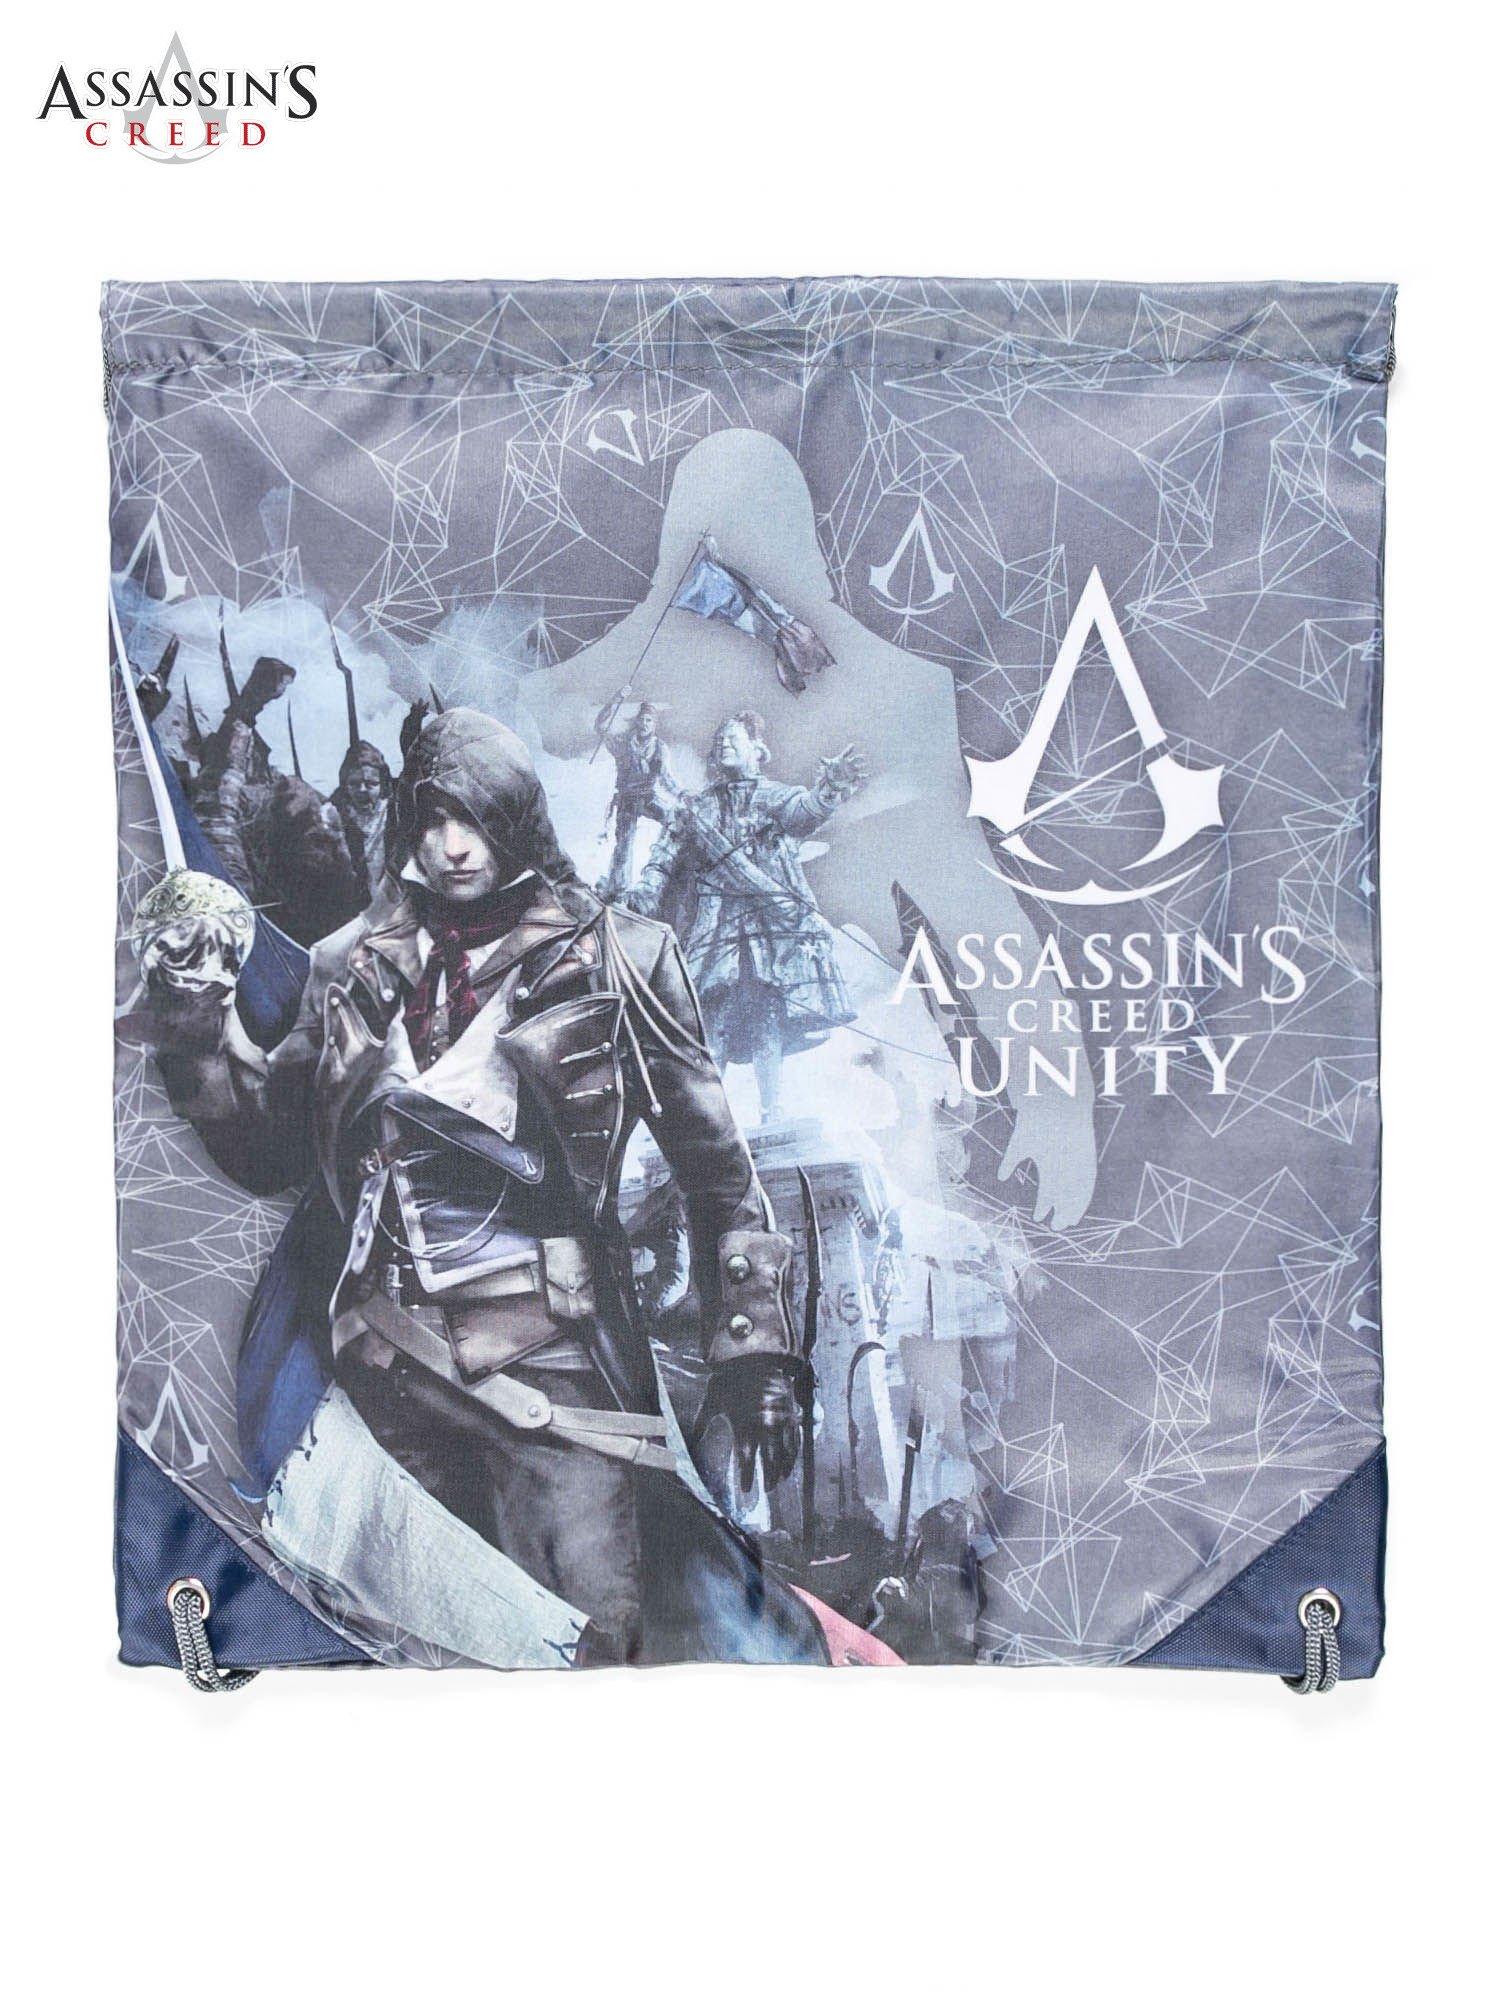 Plecak typu worek z nadrukiem ASSASSIN'S CREED